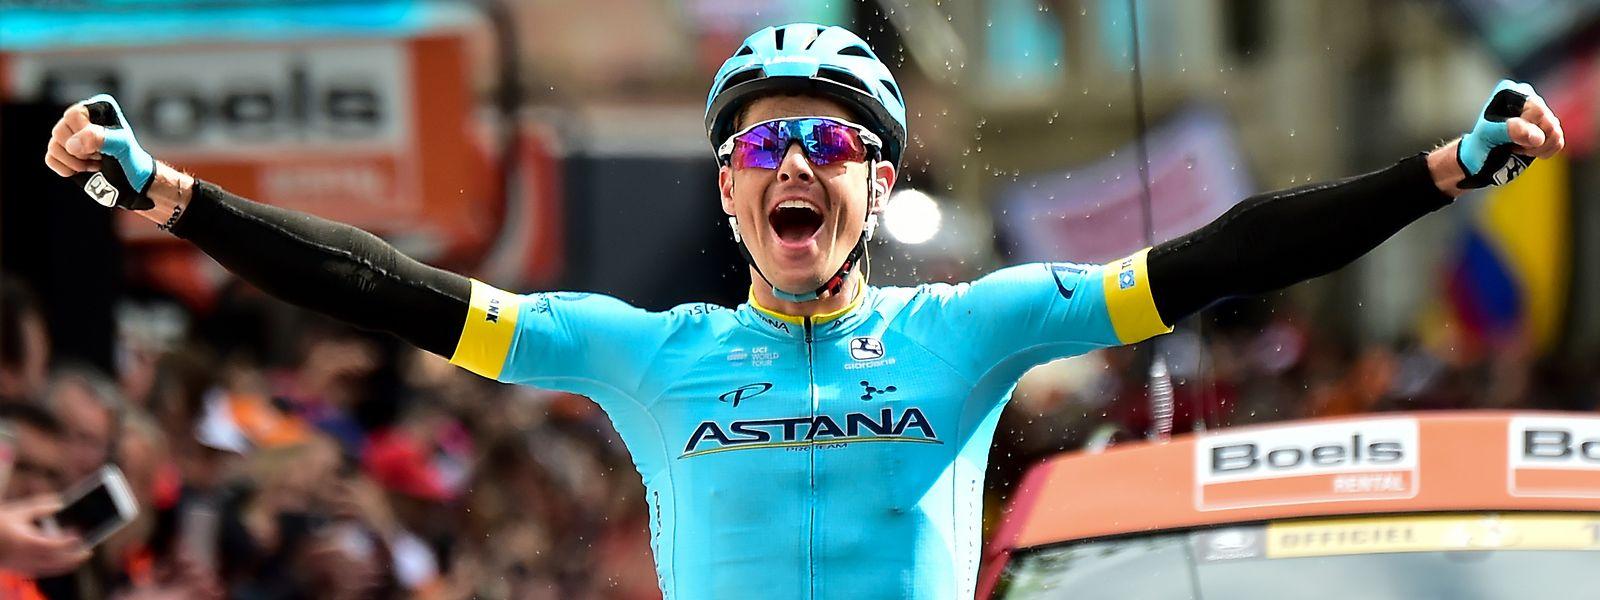 Jakob Fuglsang sicherte sich im vergangenen Jahr den Sieg beim Klassiker Liège-Bastogne-Liège.